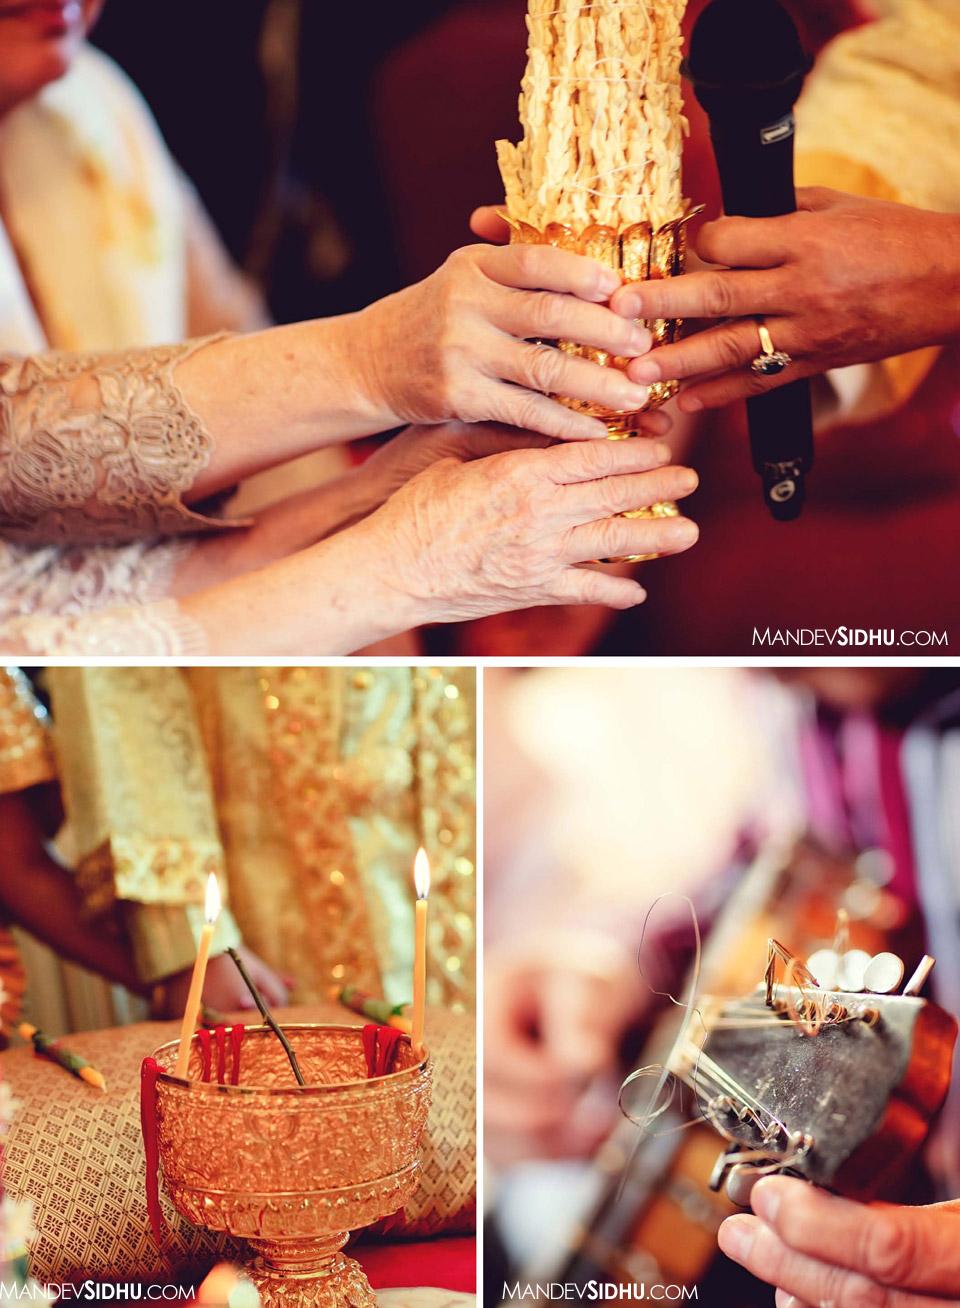 Khmer-Cambodian-wedding-ceremony